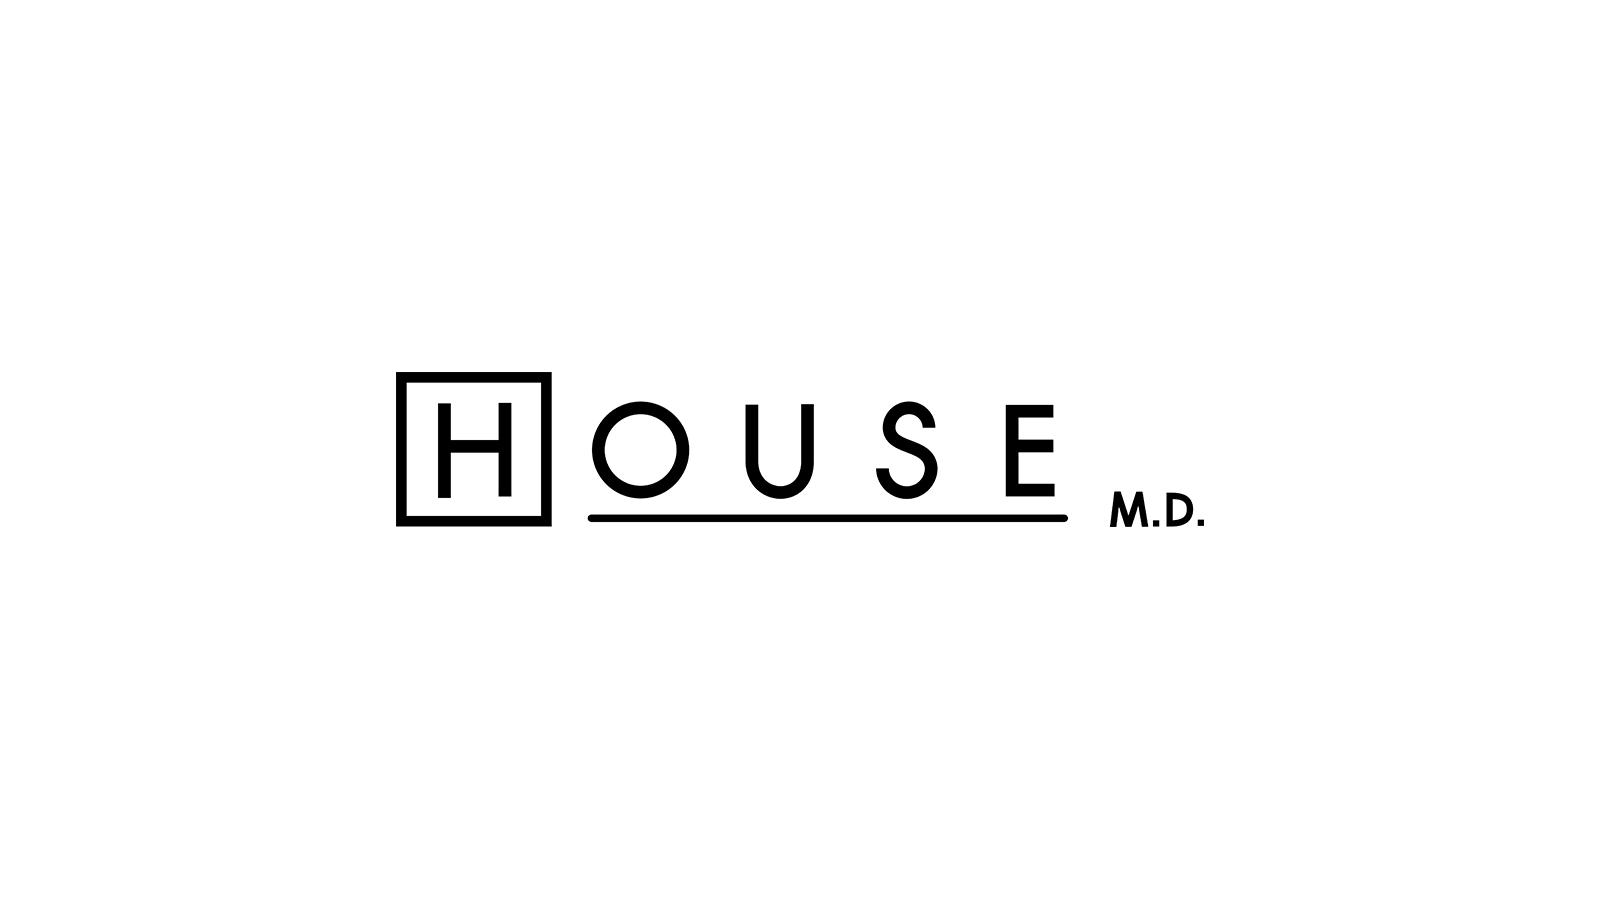 M sicas que tocam na s rie house m d matheus produ es for House md music